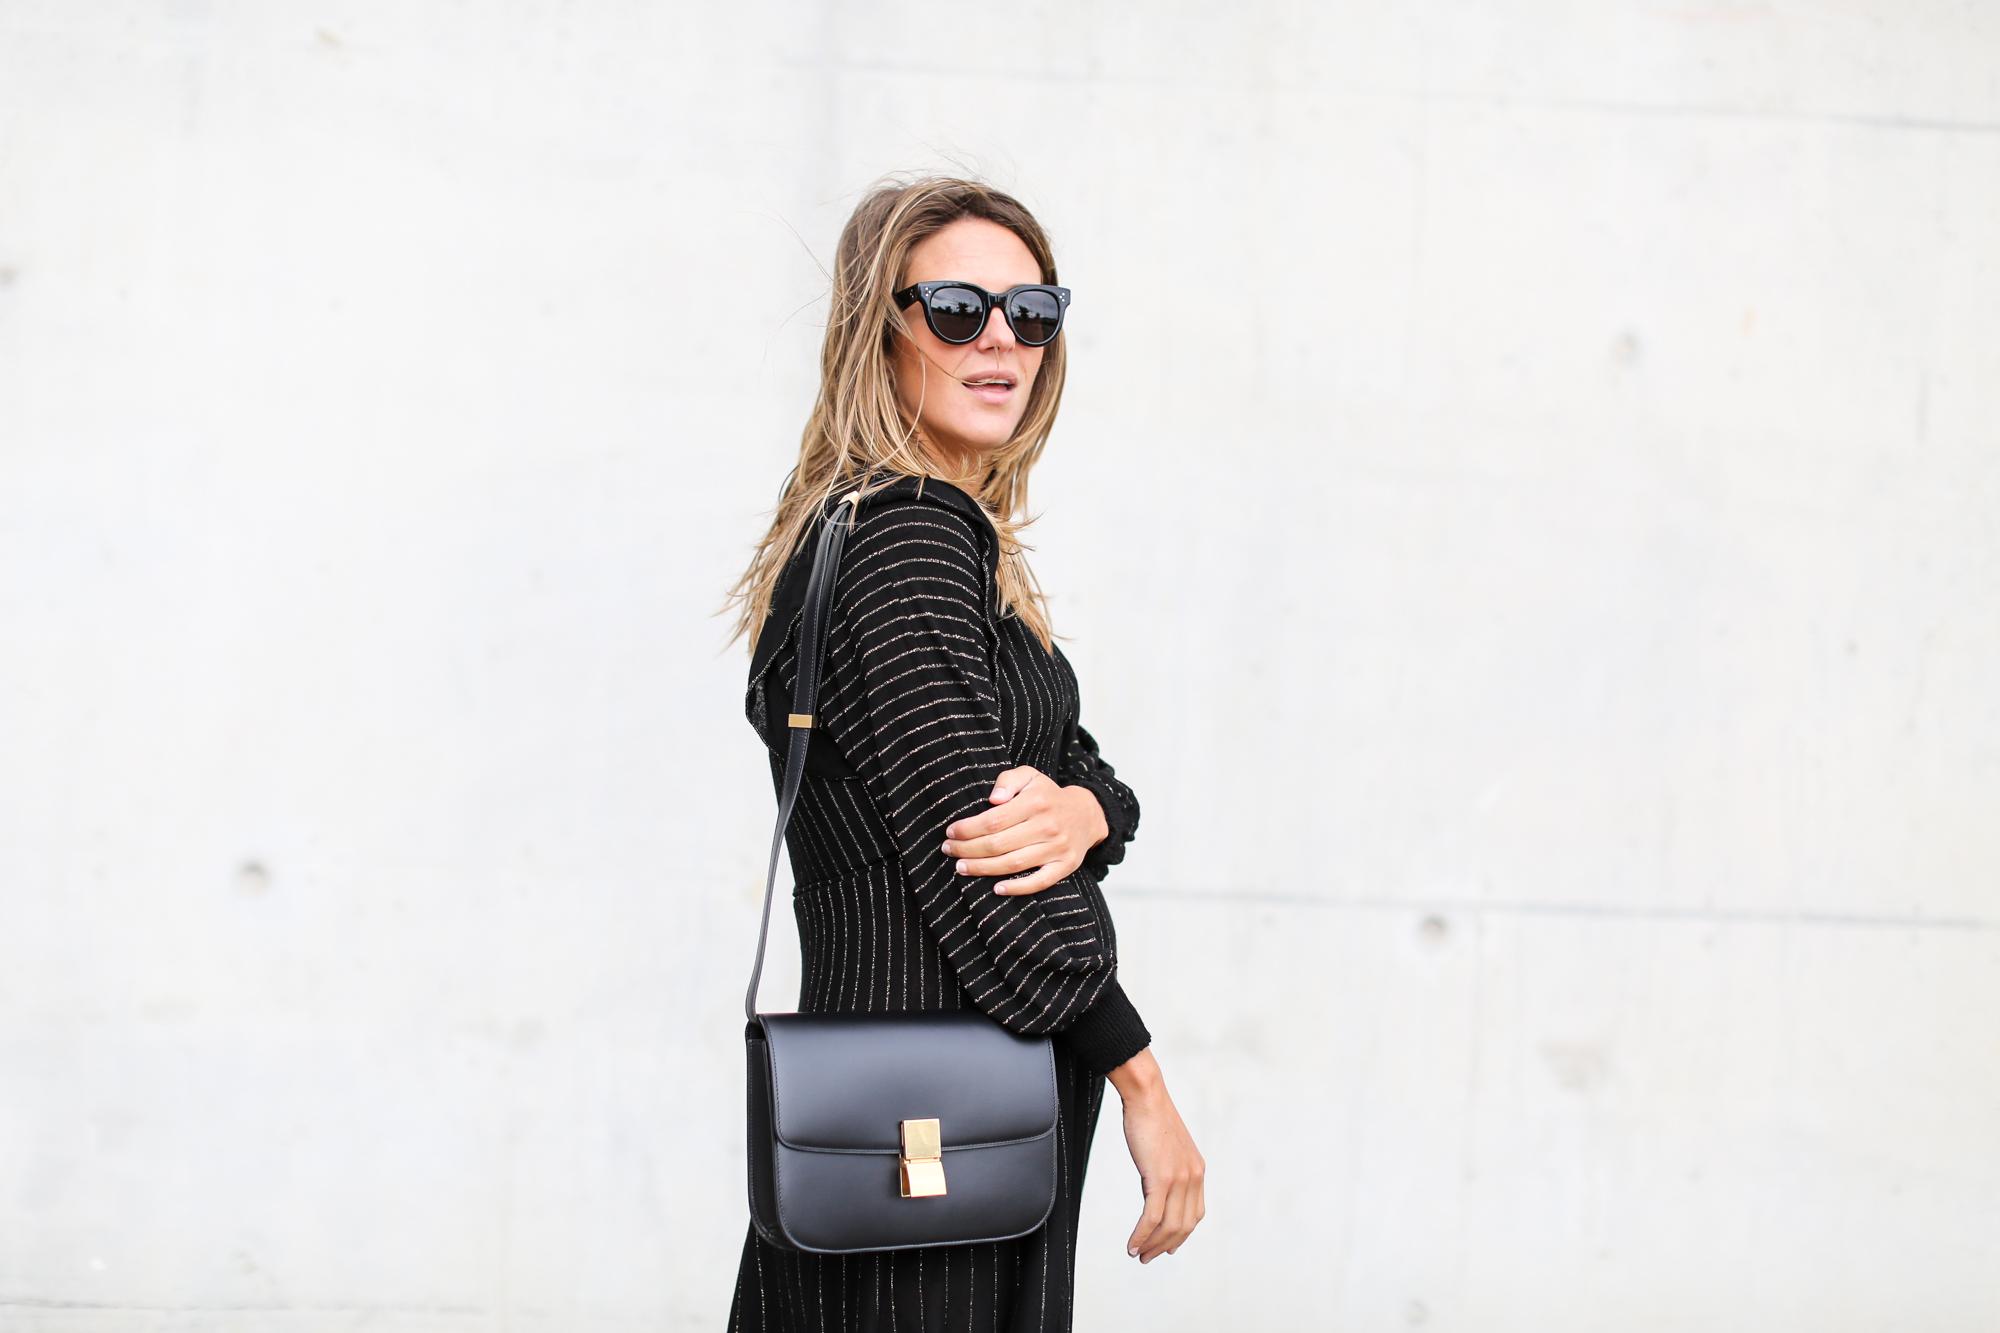 Clochet_streetstyle_fashionblogger_zaraknitdress_specialedition_celineboxbag_celinesunglasses-4